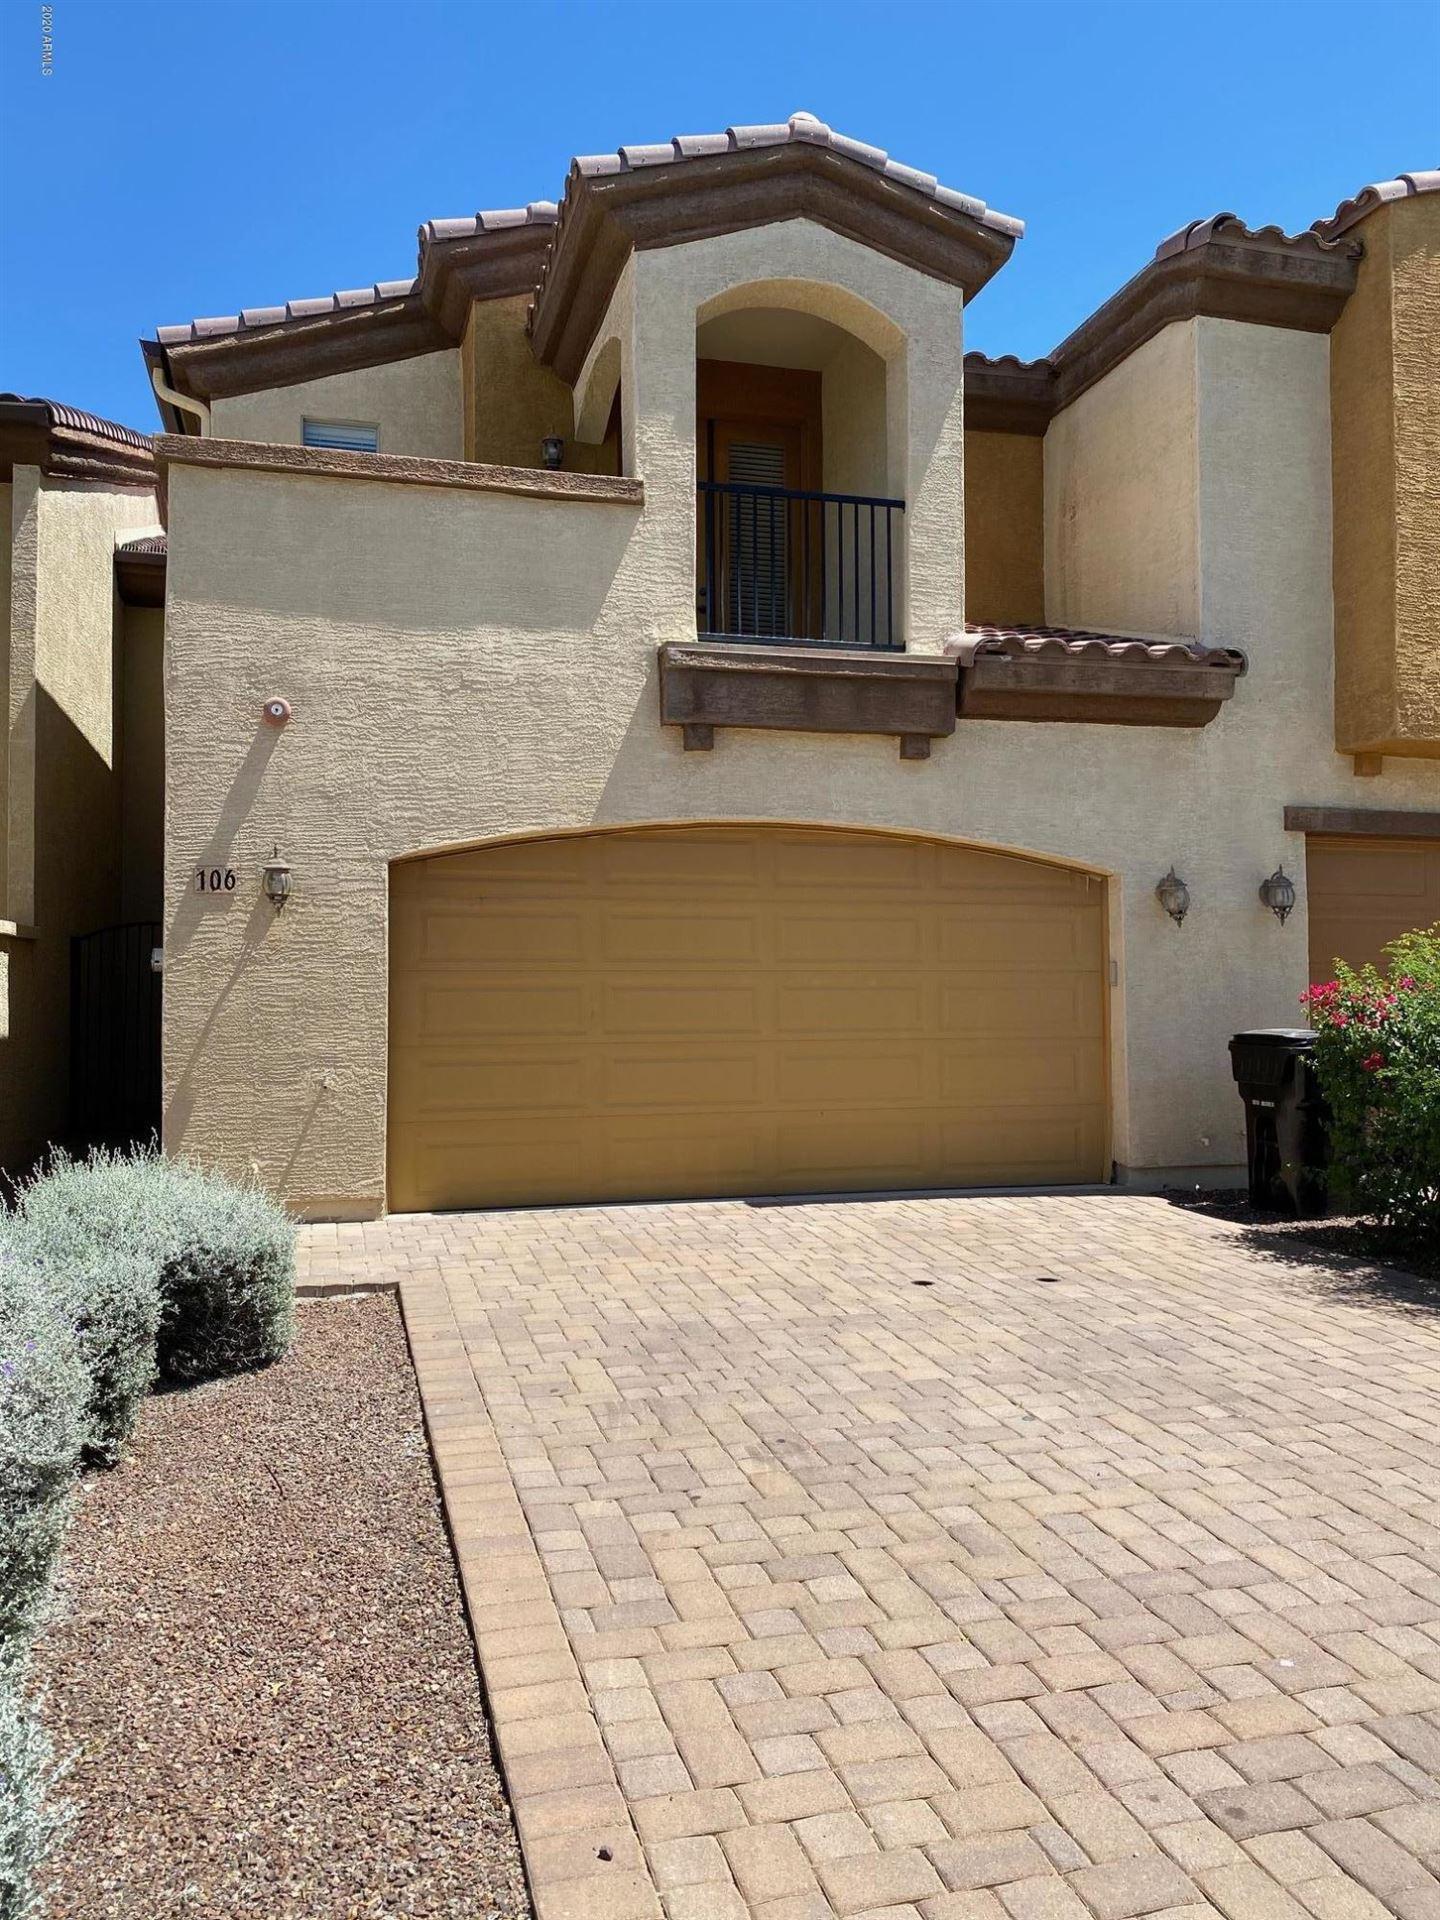 Photo of 2925 N SERICIN Road #106, Mesa, AZ 85215 (MLS # 6083143)